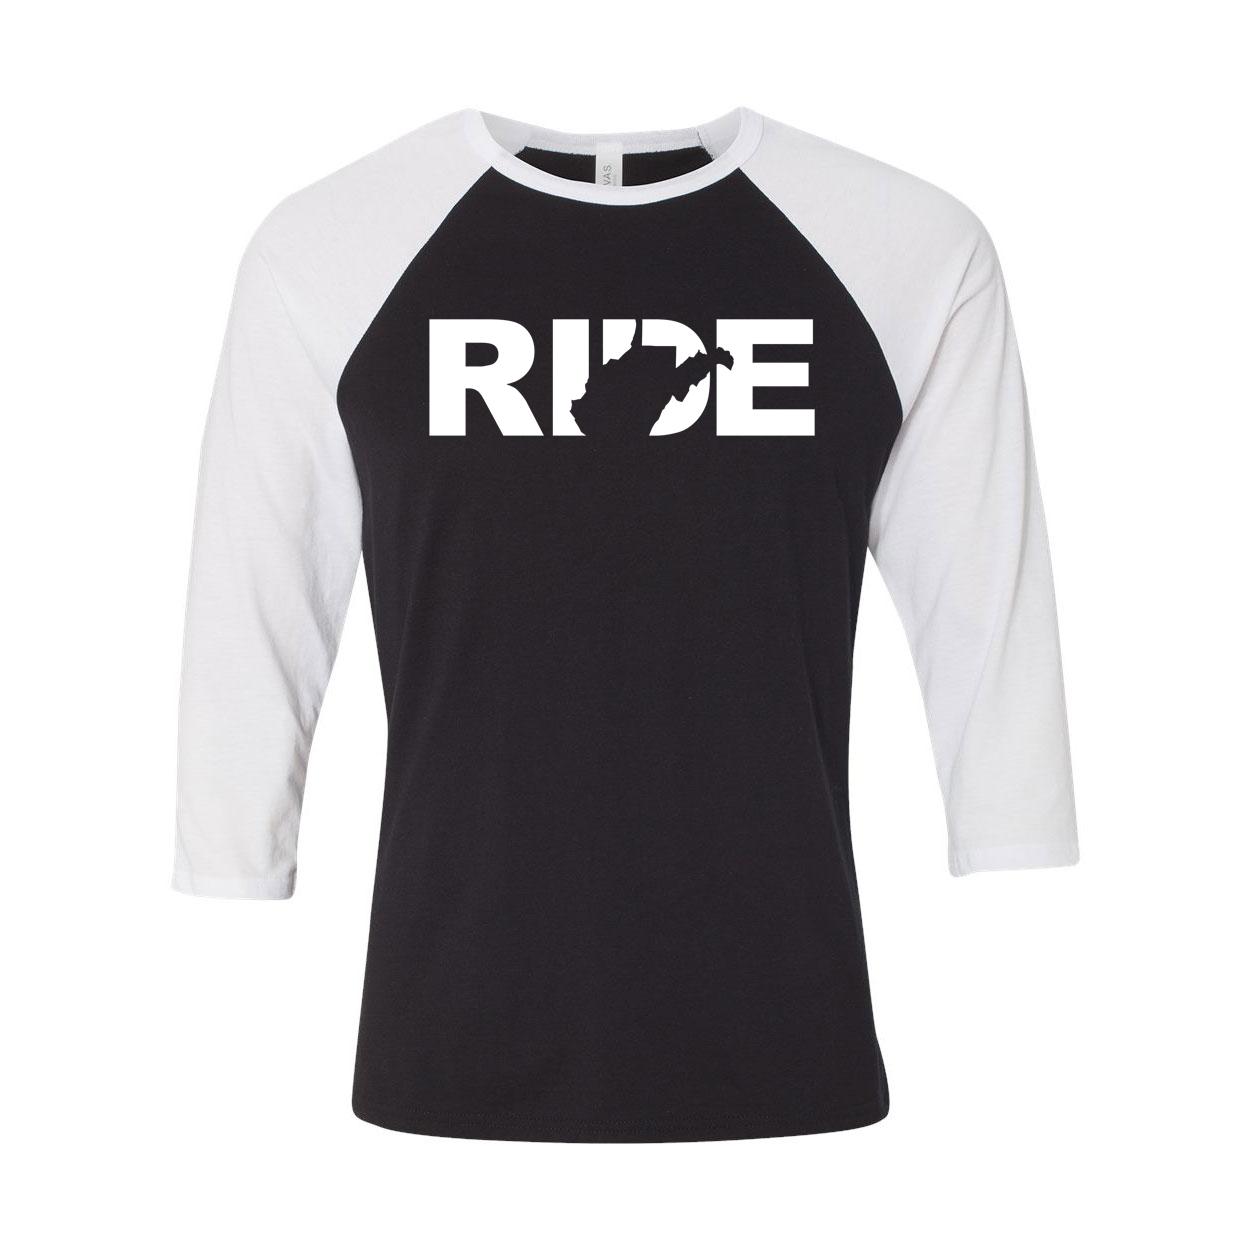 Ride West Virginia Classic Raglan Shirt Black/White (White Logo)